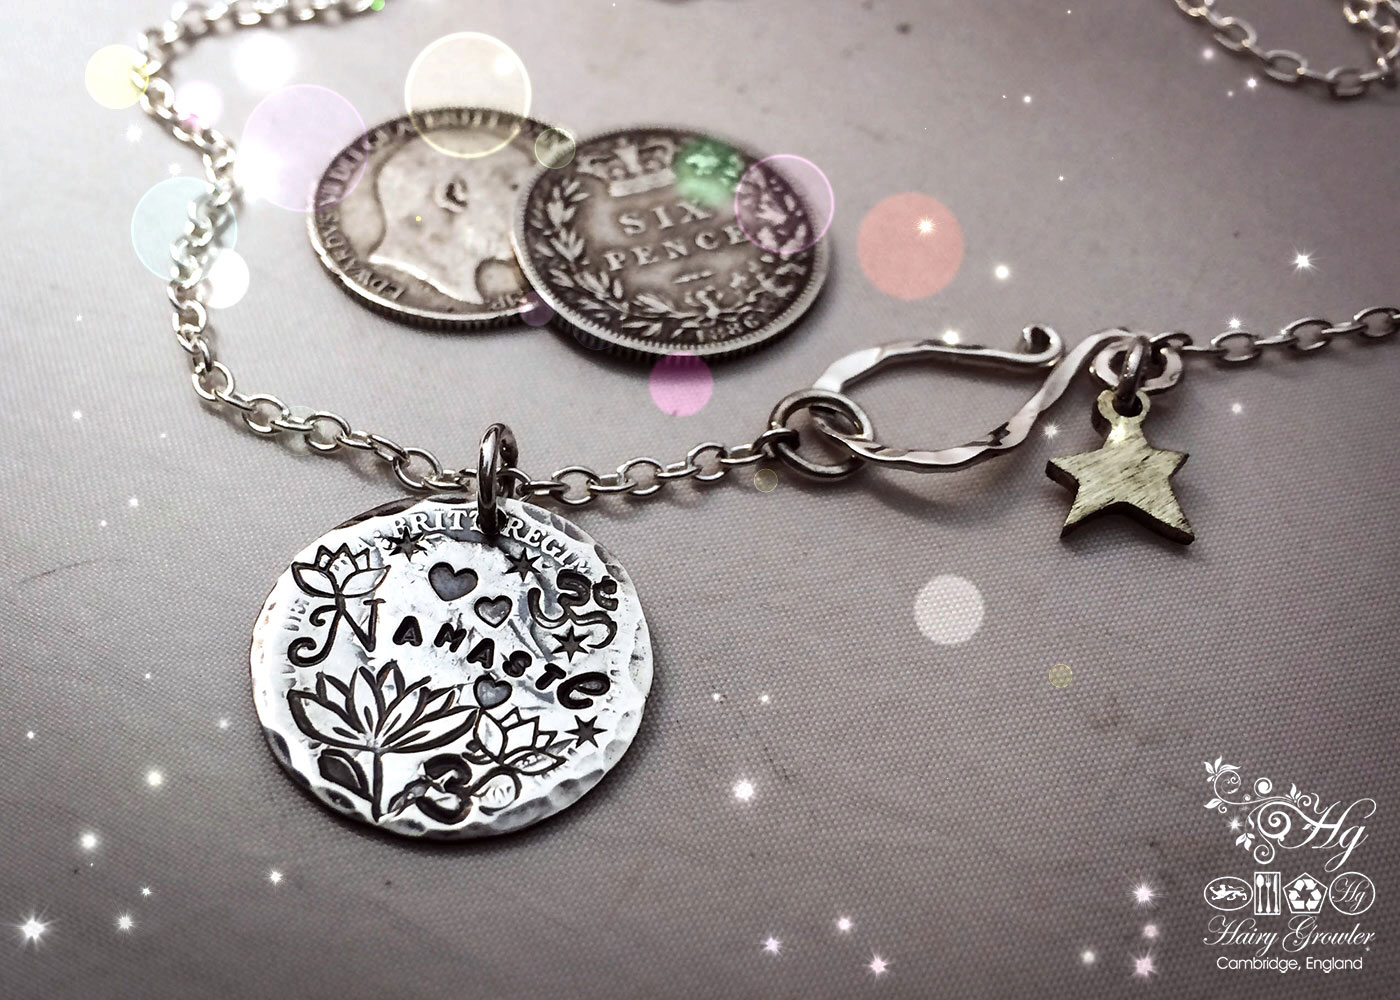 Nameste silver kundalini yoga necklace - handmade and recycled using sixpences